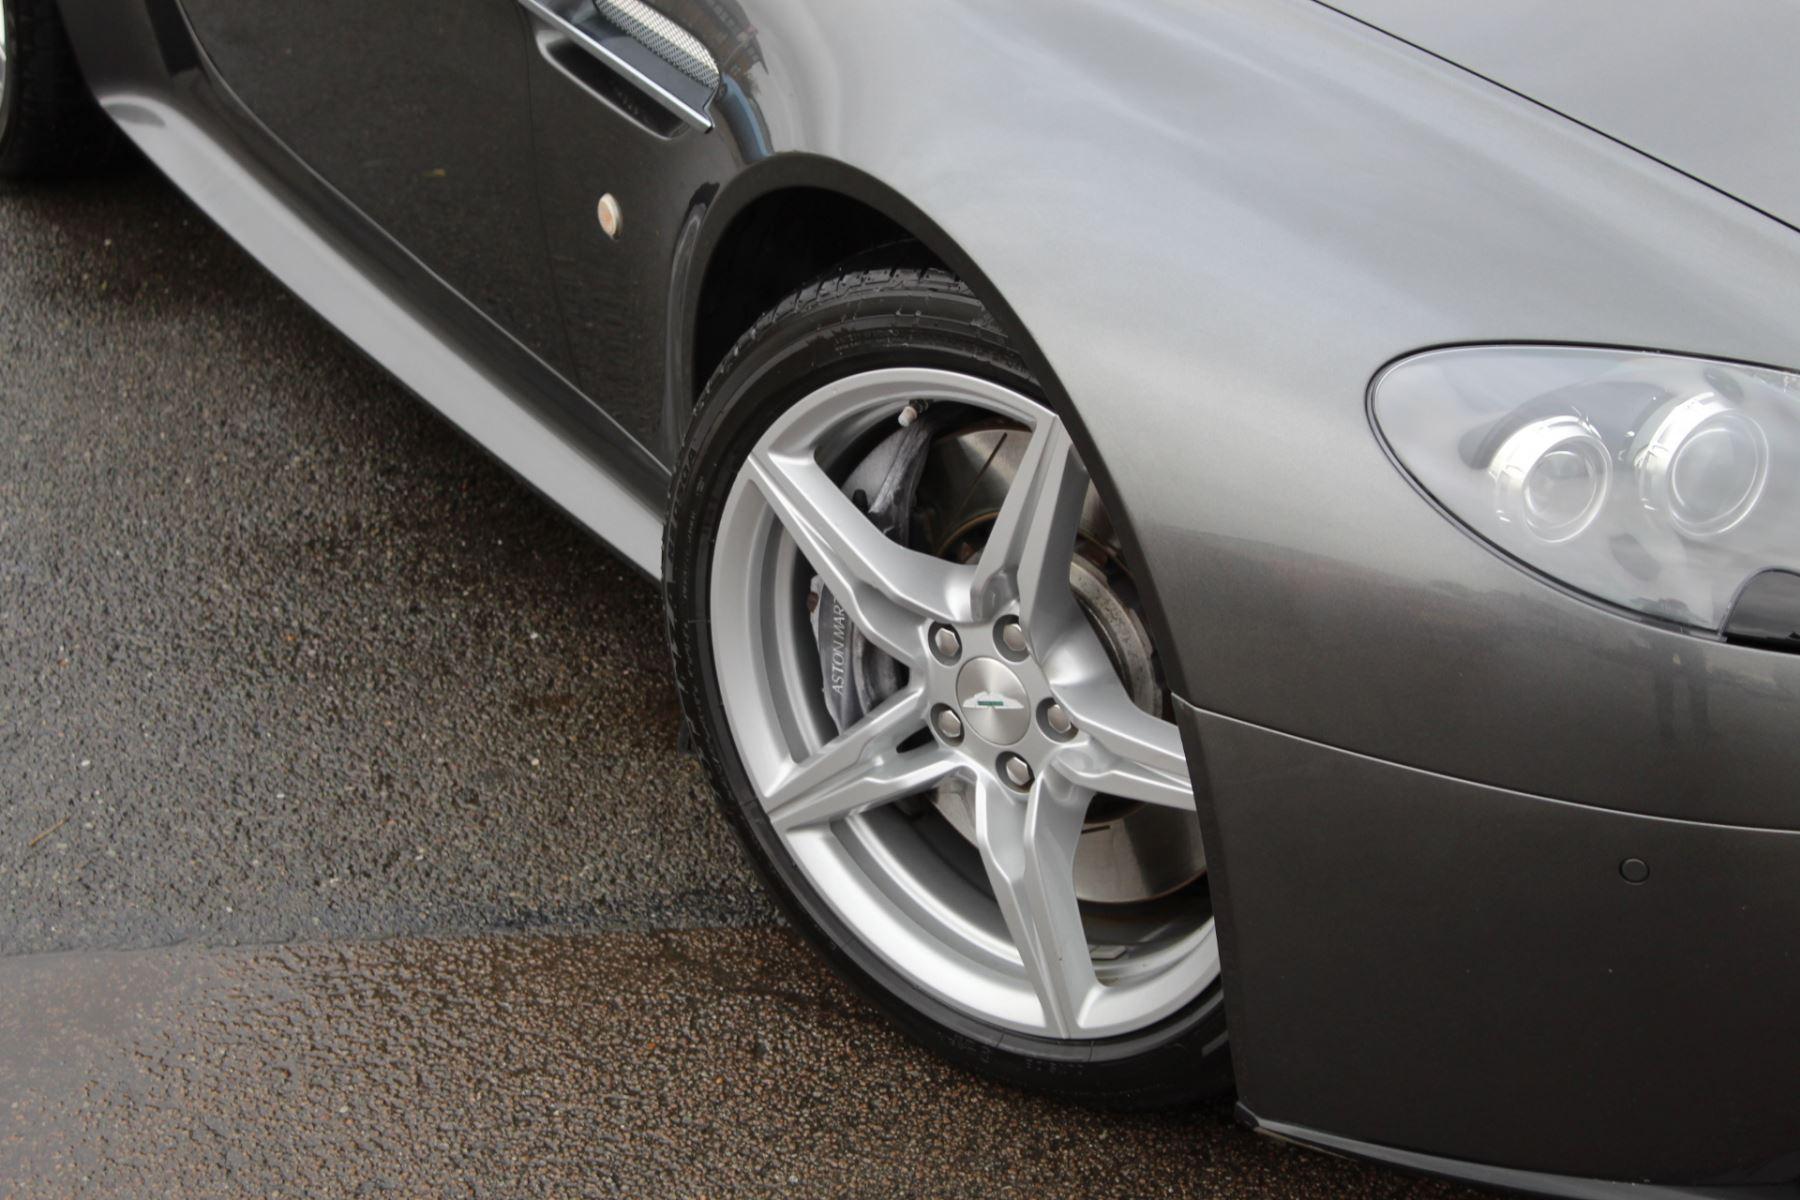 Aston Martin V8 Vantage S Coupe S 2dr Sportshift image 3